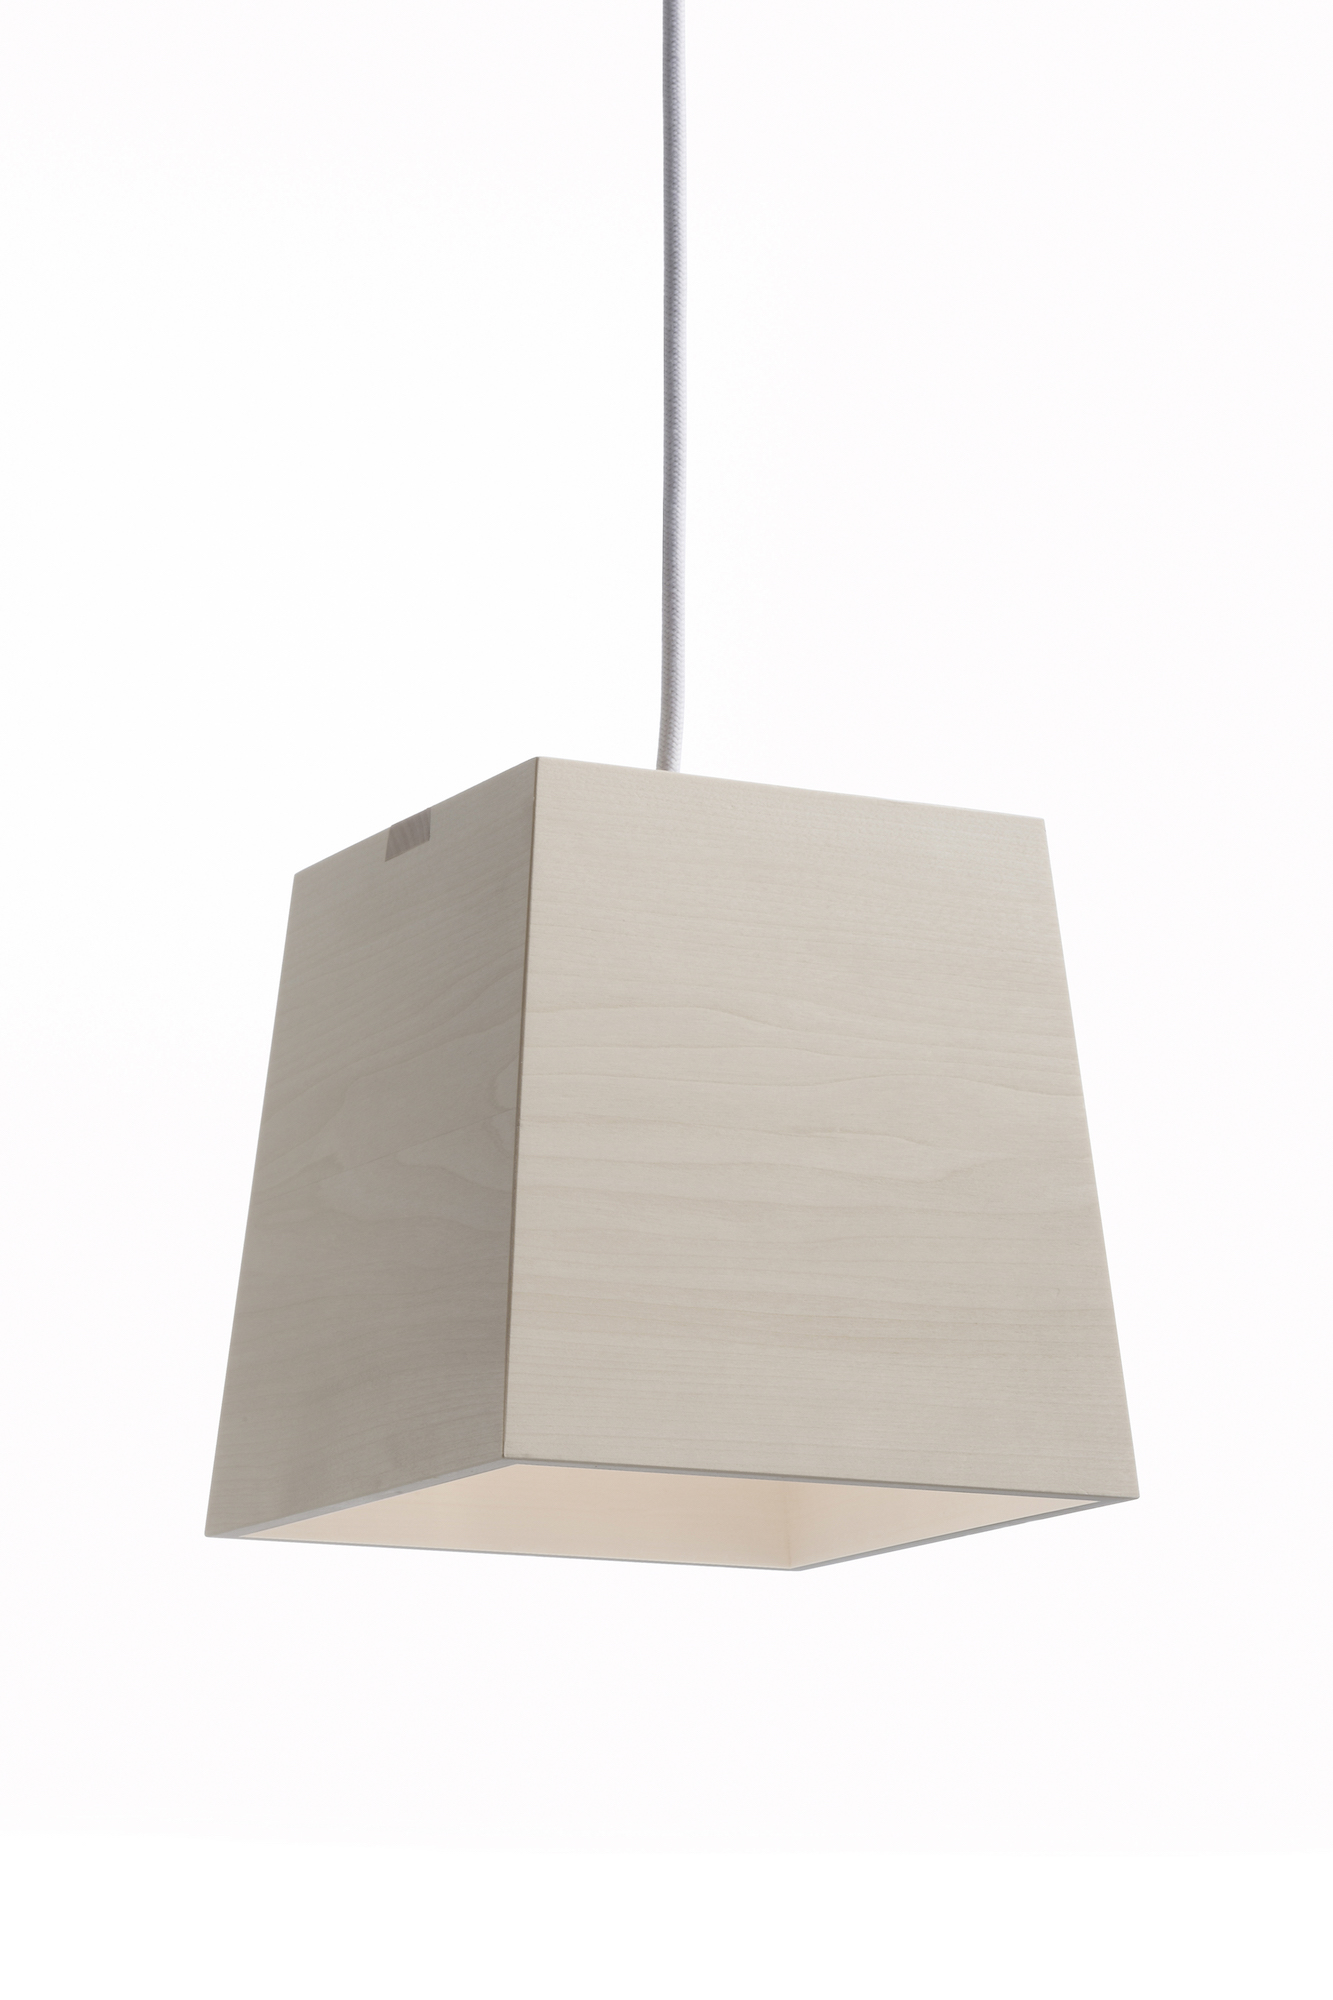 Valo 002 Pendant Lamp